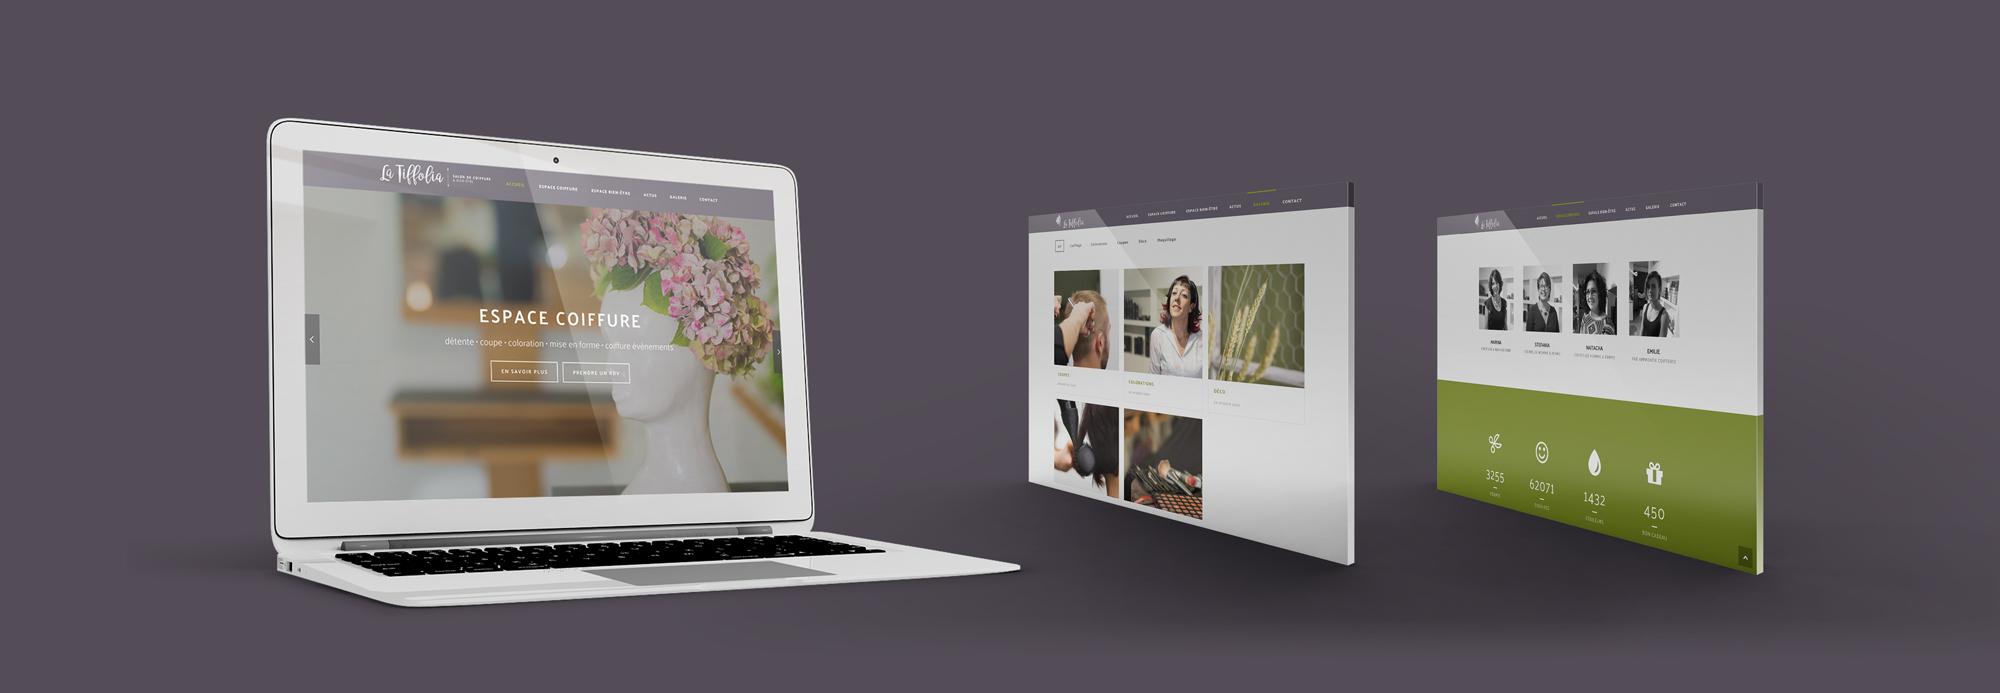 latiffolia identité coiffure branding retail design web mobile